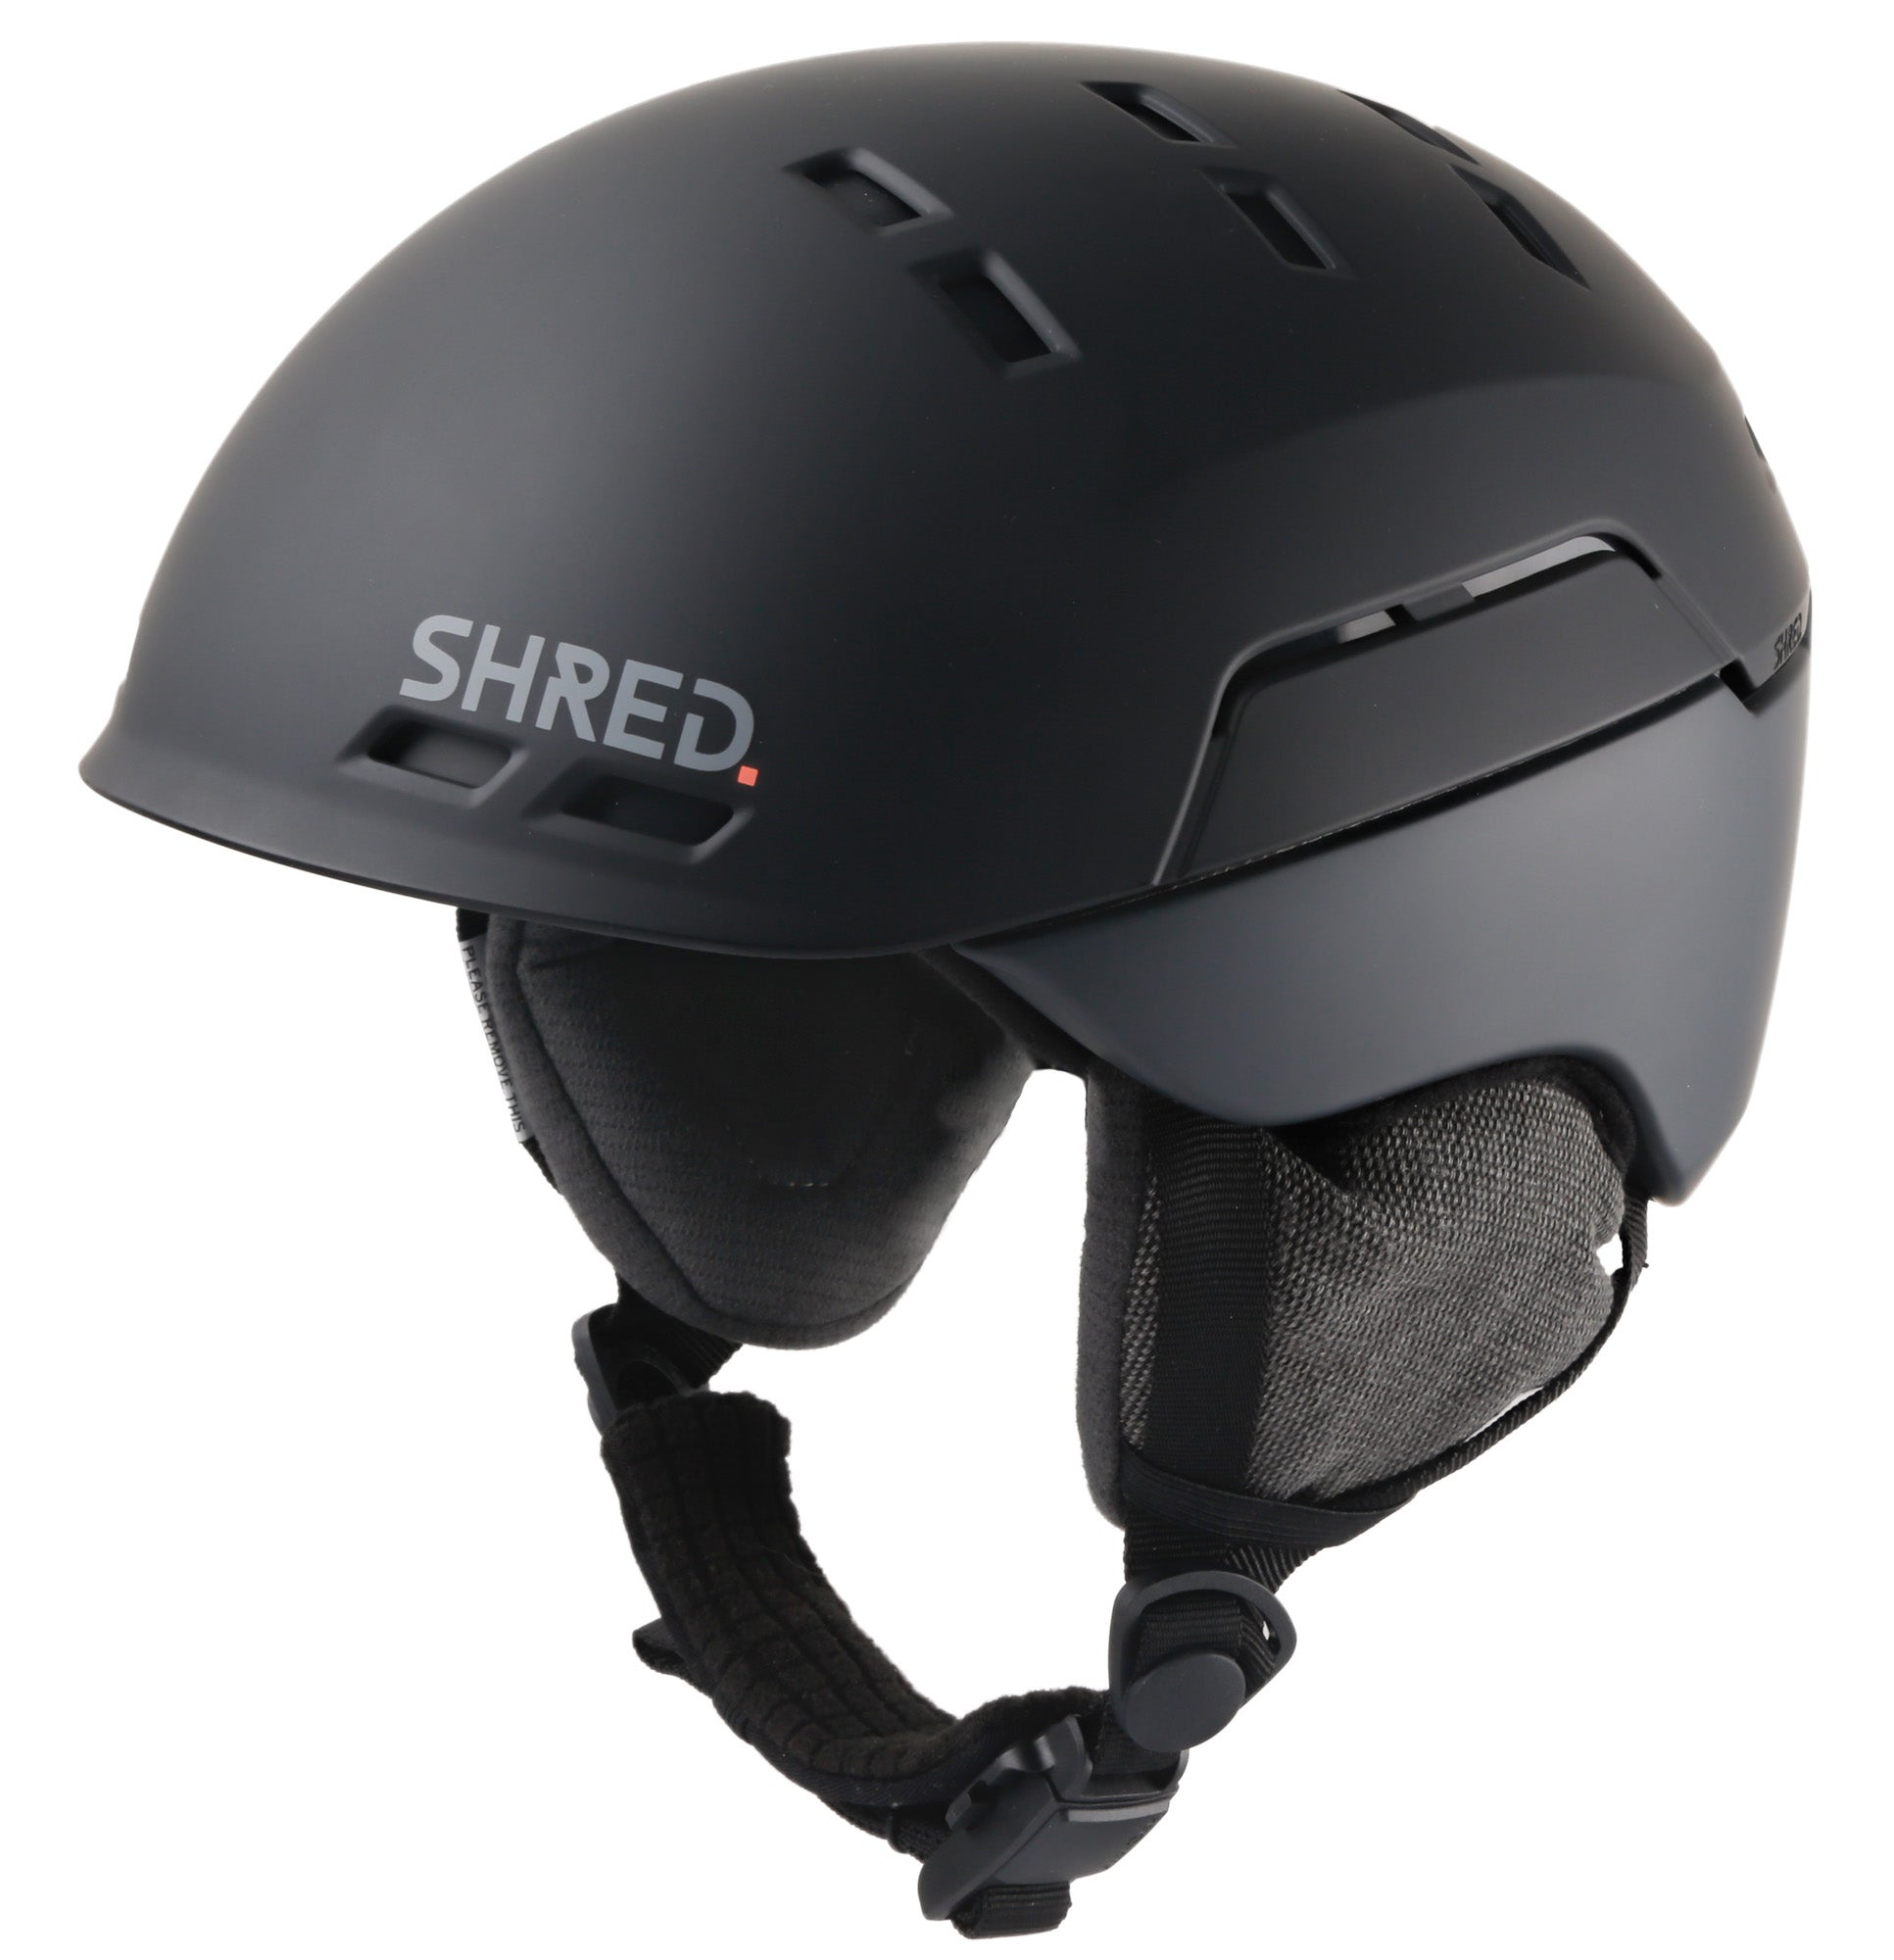 Shred Notion Helmet